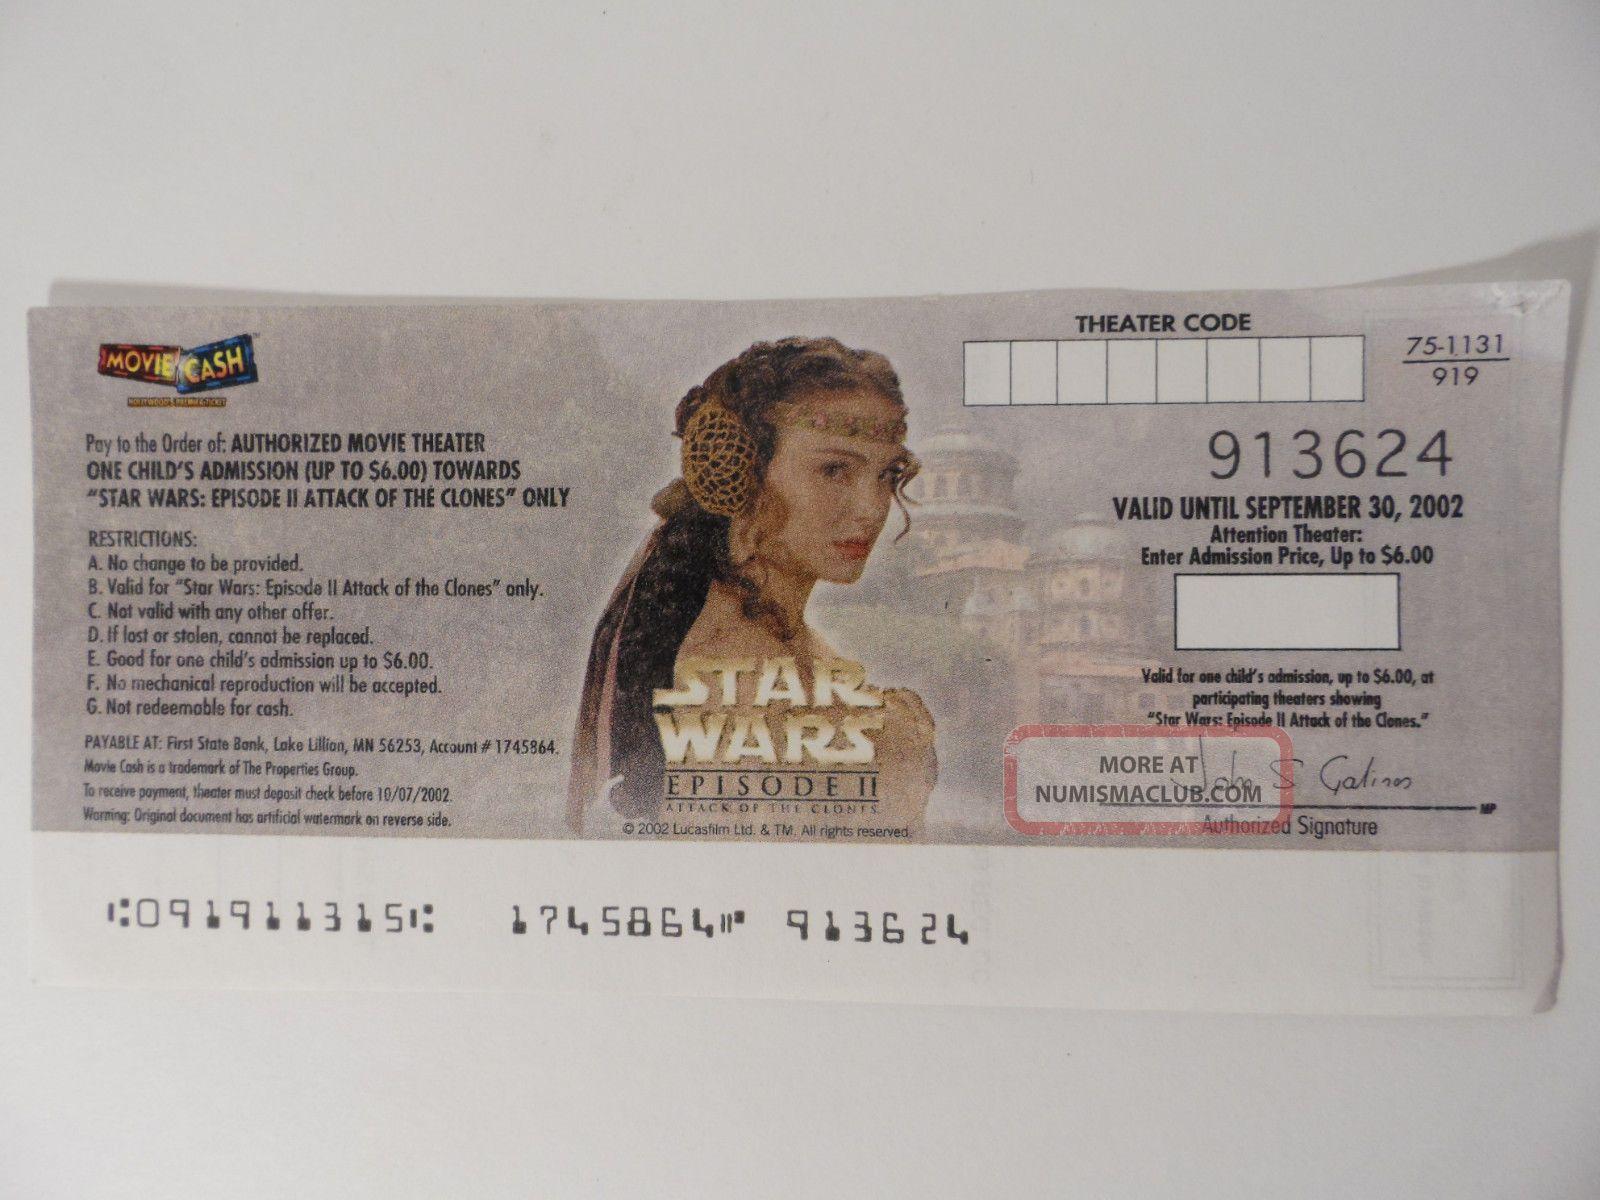 Star Wars Episode Ii Queen Amidala Movie Cash Expired Portman Us Paper Money: US photo